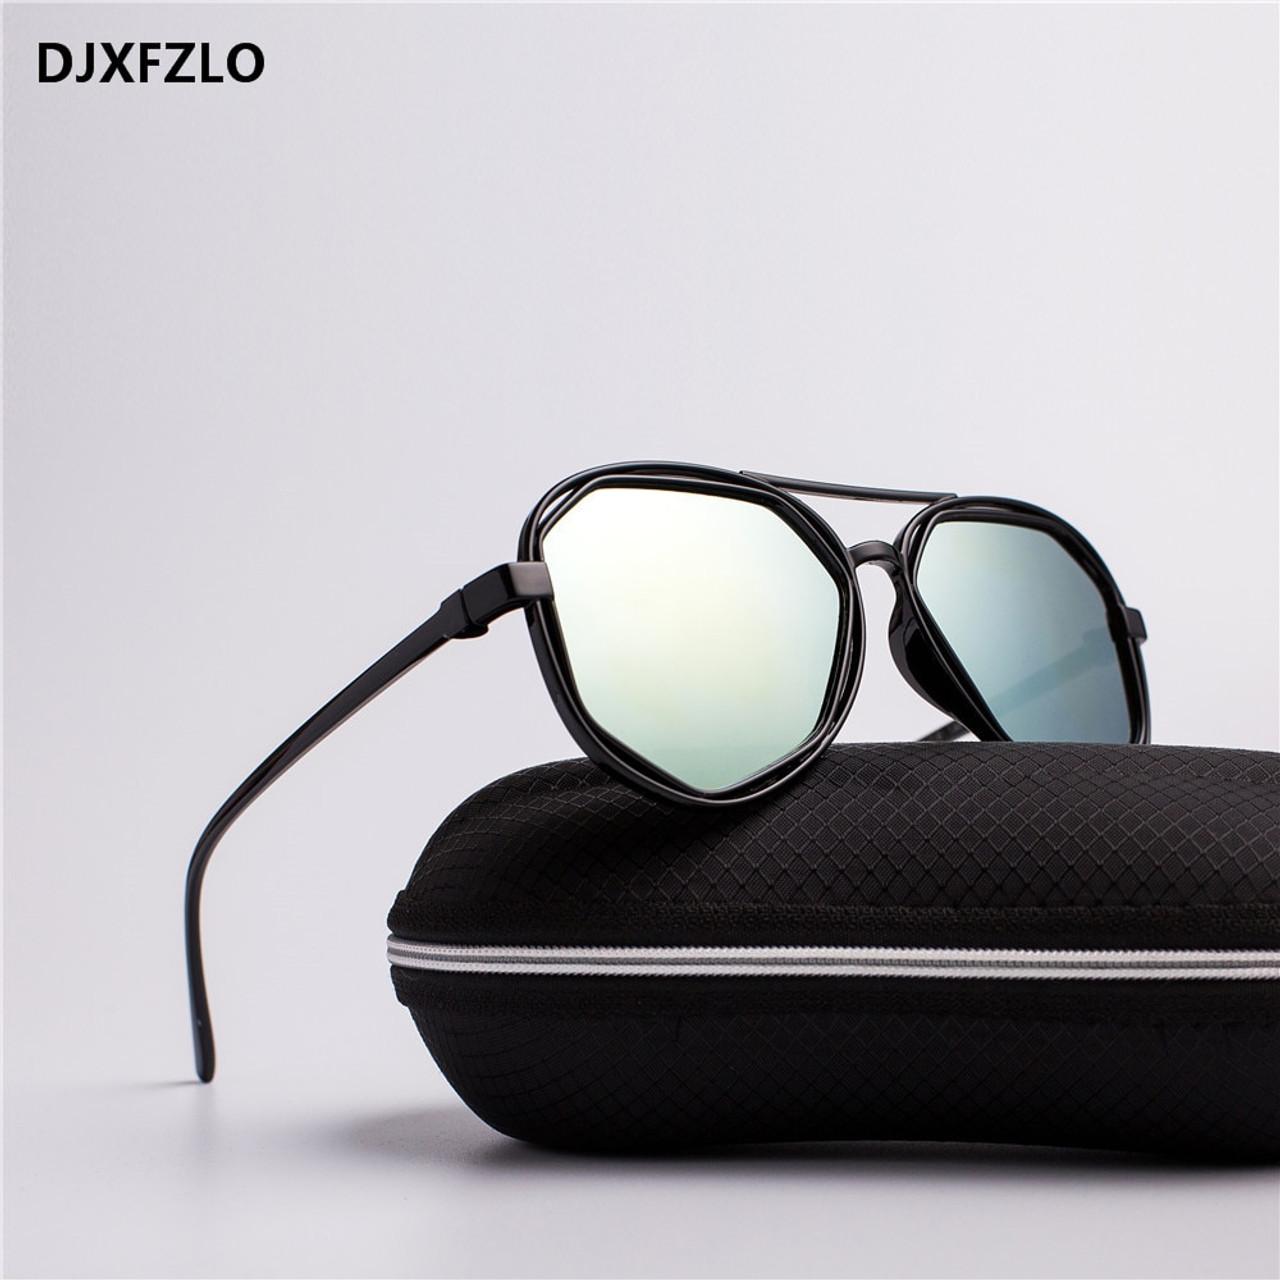 aebd0f7d757 ... DJXFZLO Fashion Goggle Small Frame Polygon Clear Lens Sunglasses Men  Brand Designer Vintage Sun Glasses Hexagon ...